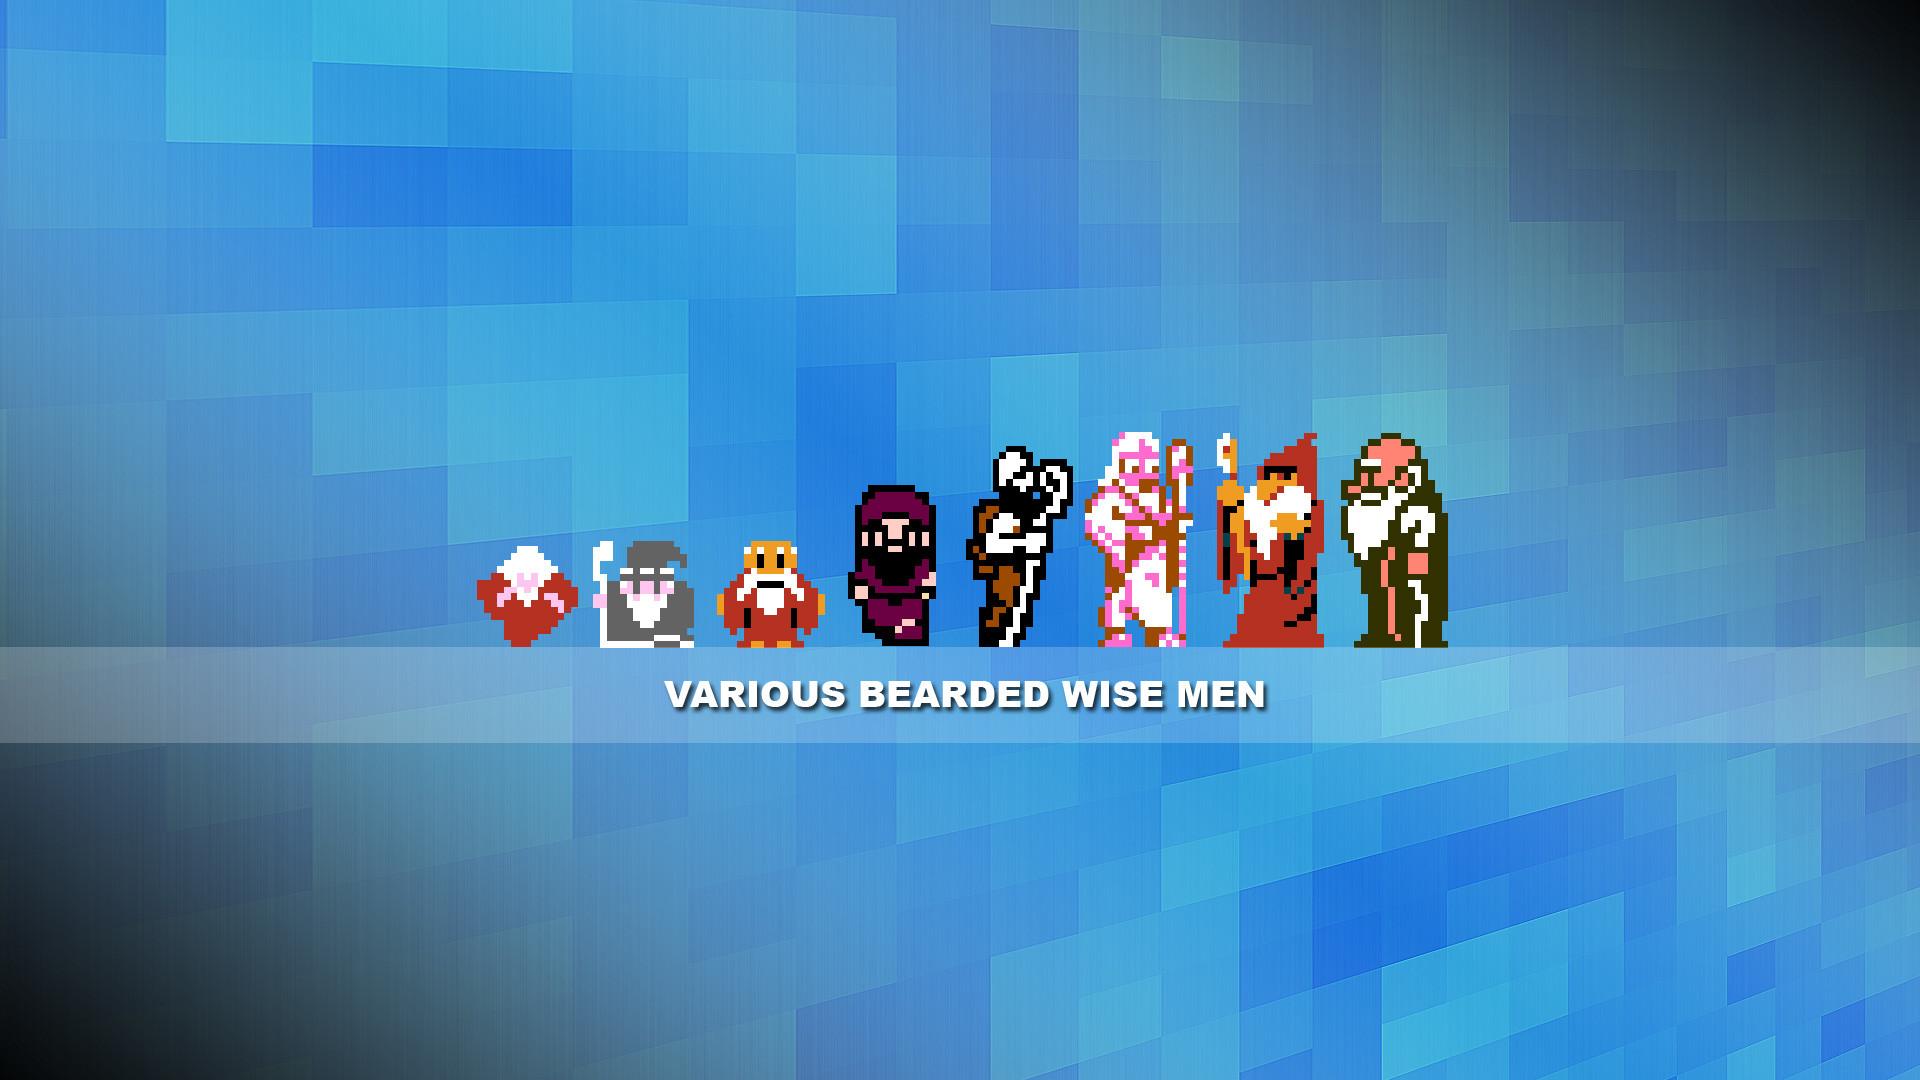 8-bit Wallpaper – Wise Men